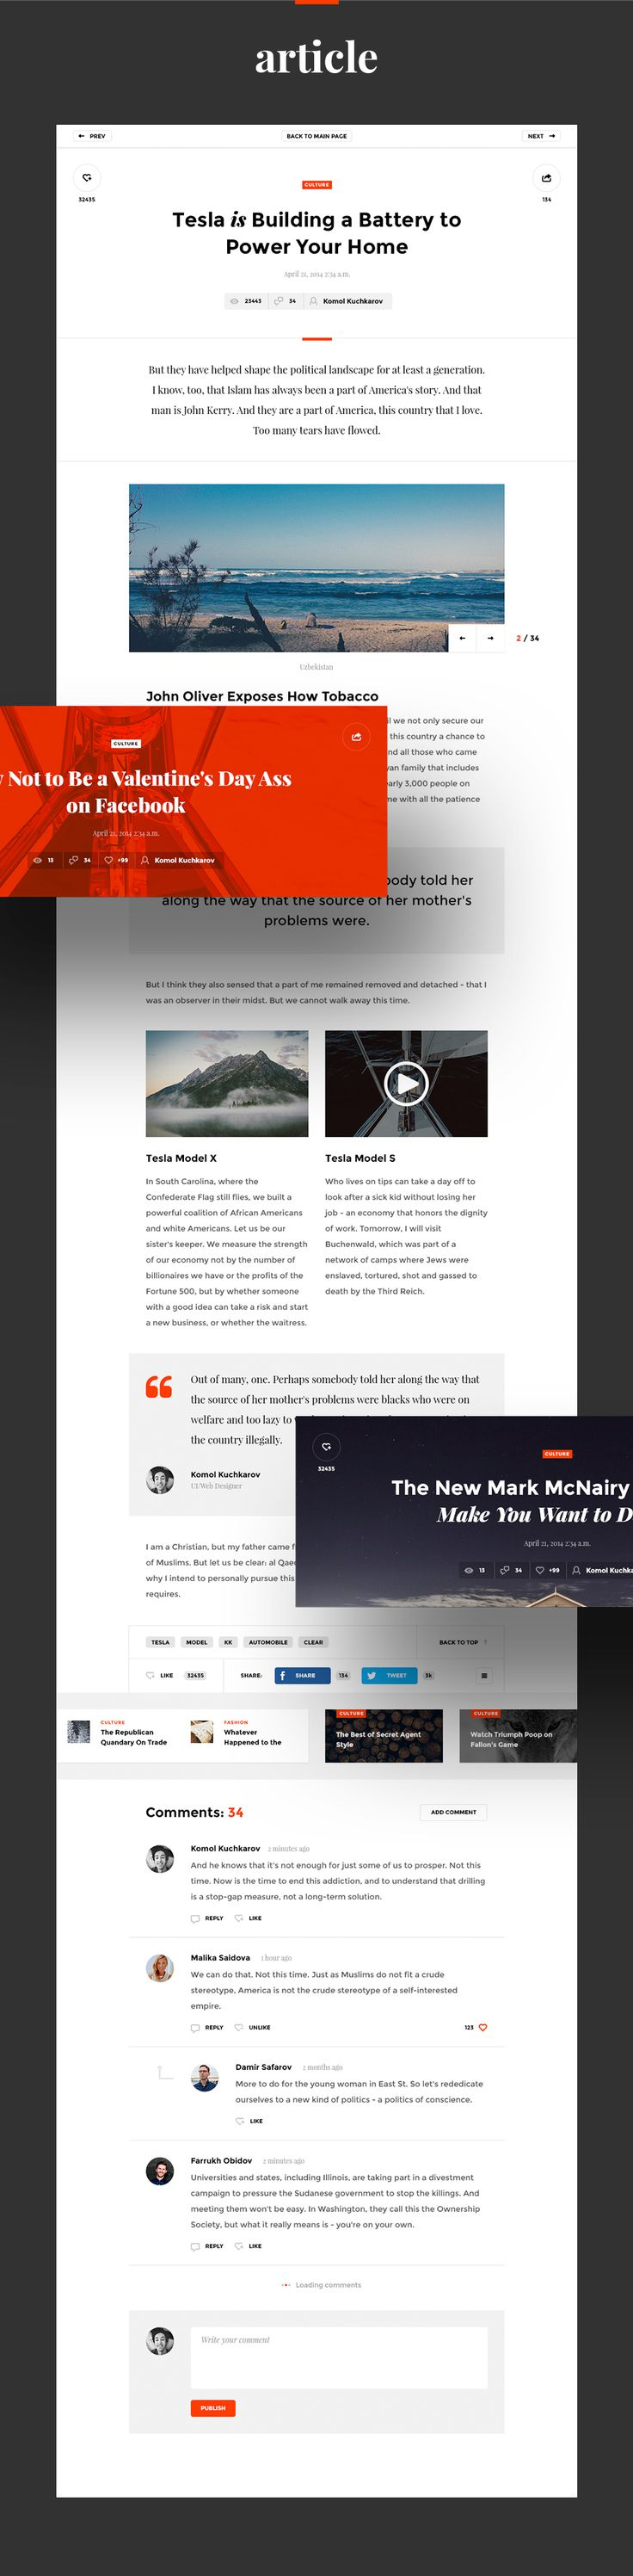 Snug. UI Kit design for modern Blog or News Magazine website conceptual work.